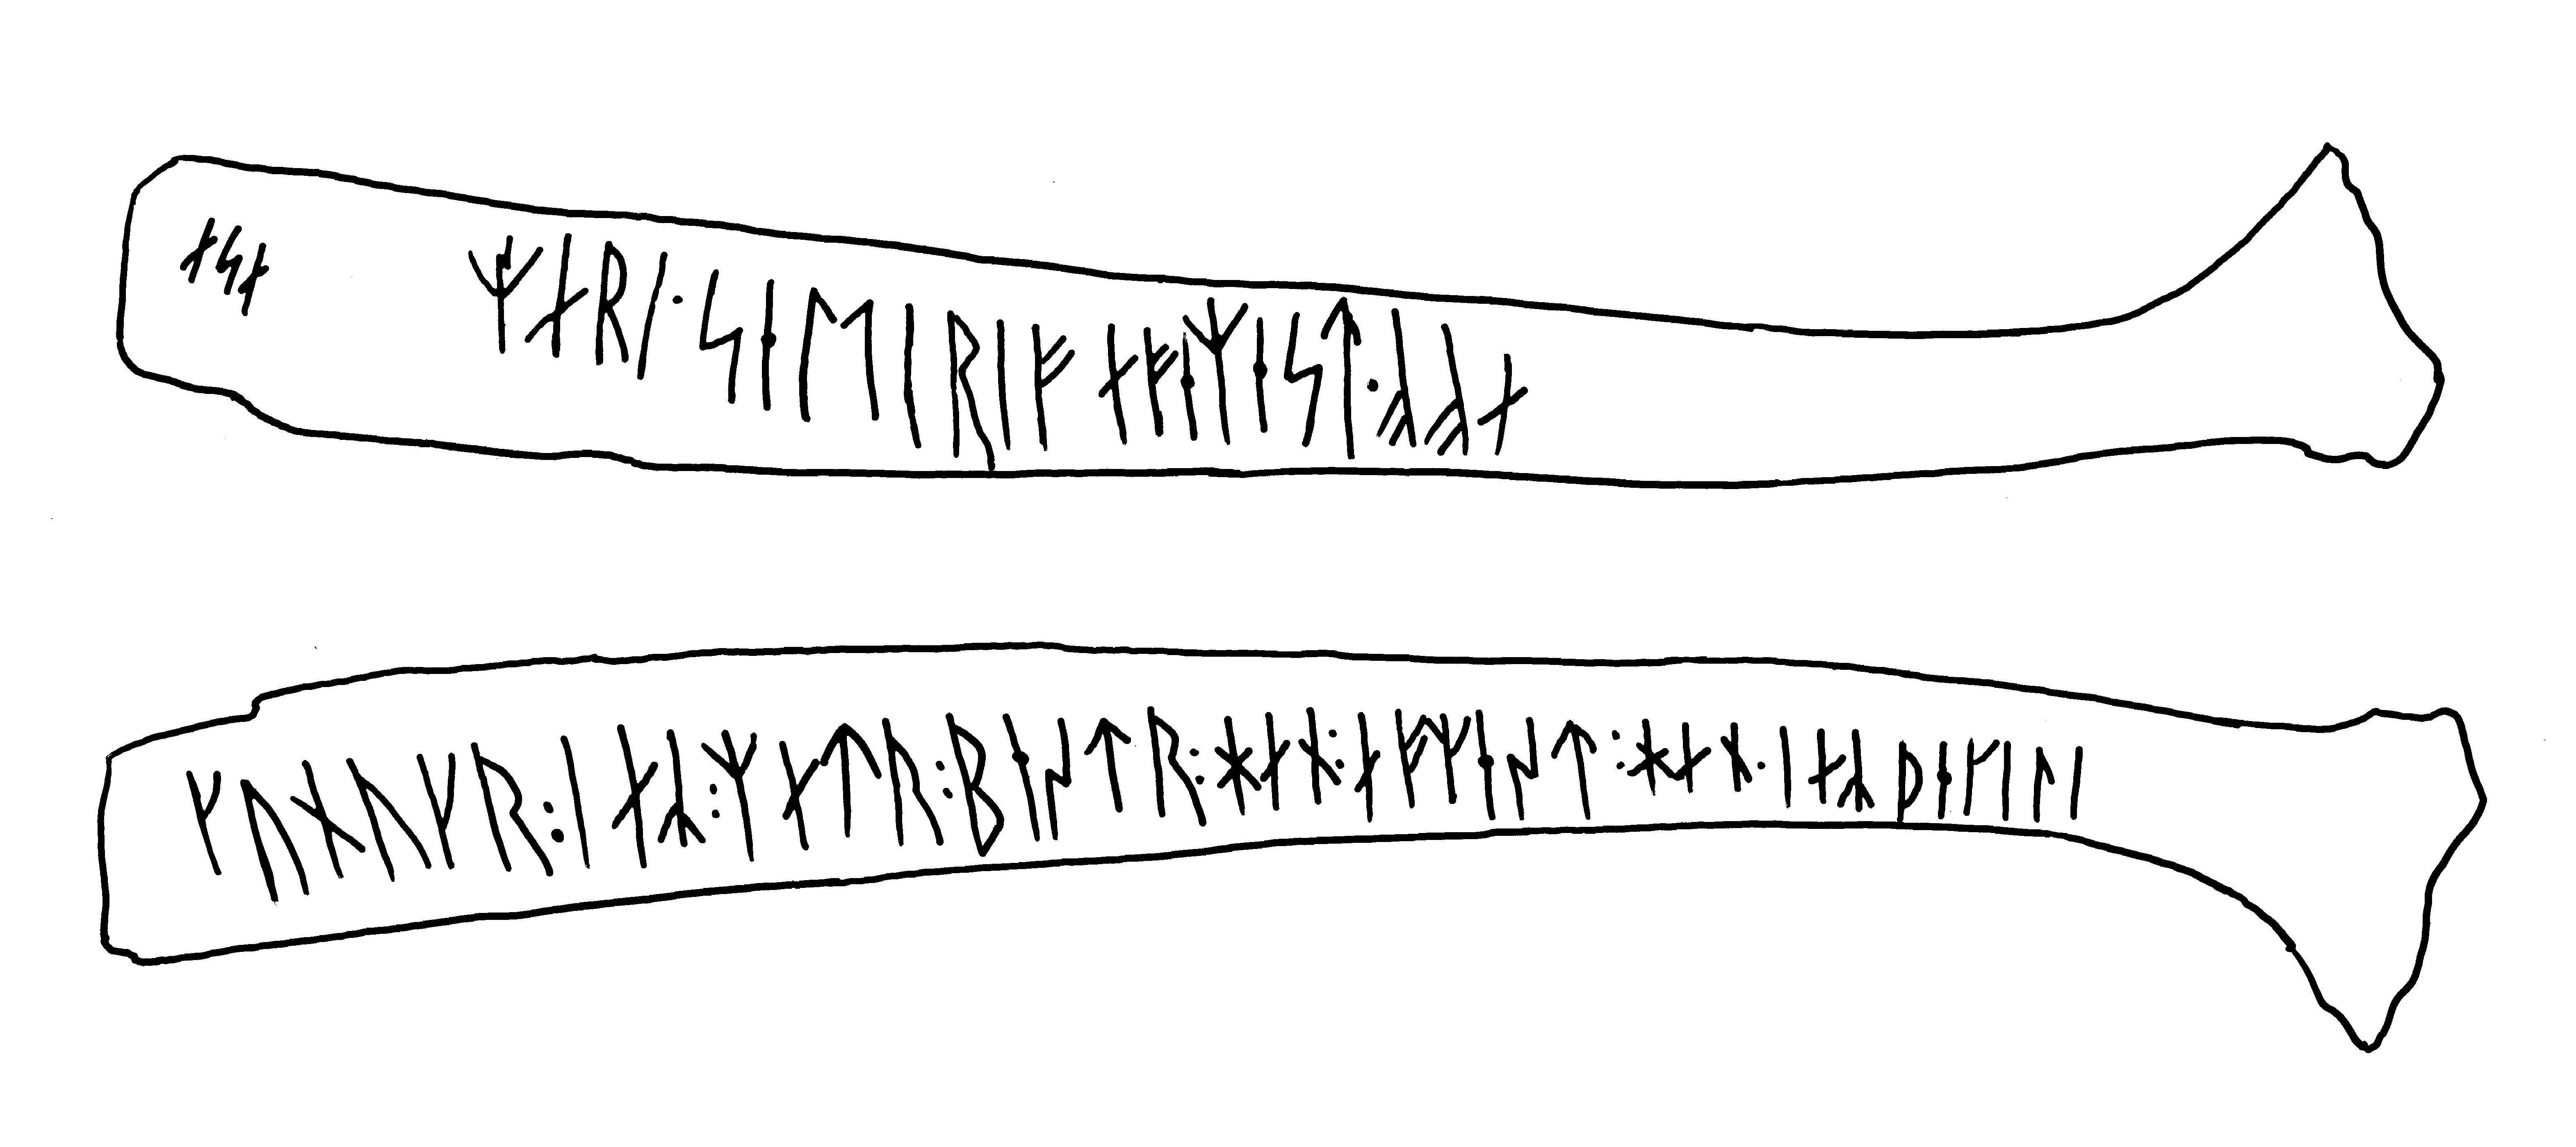 Runben från Sigtuna